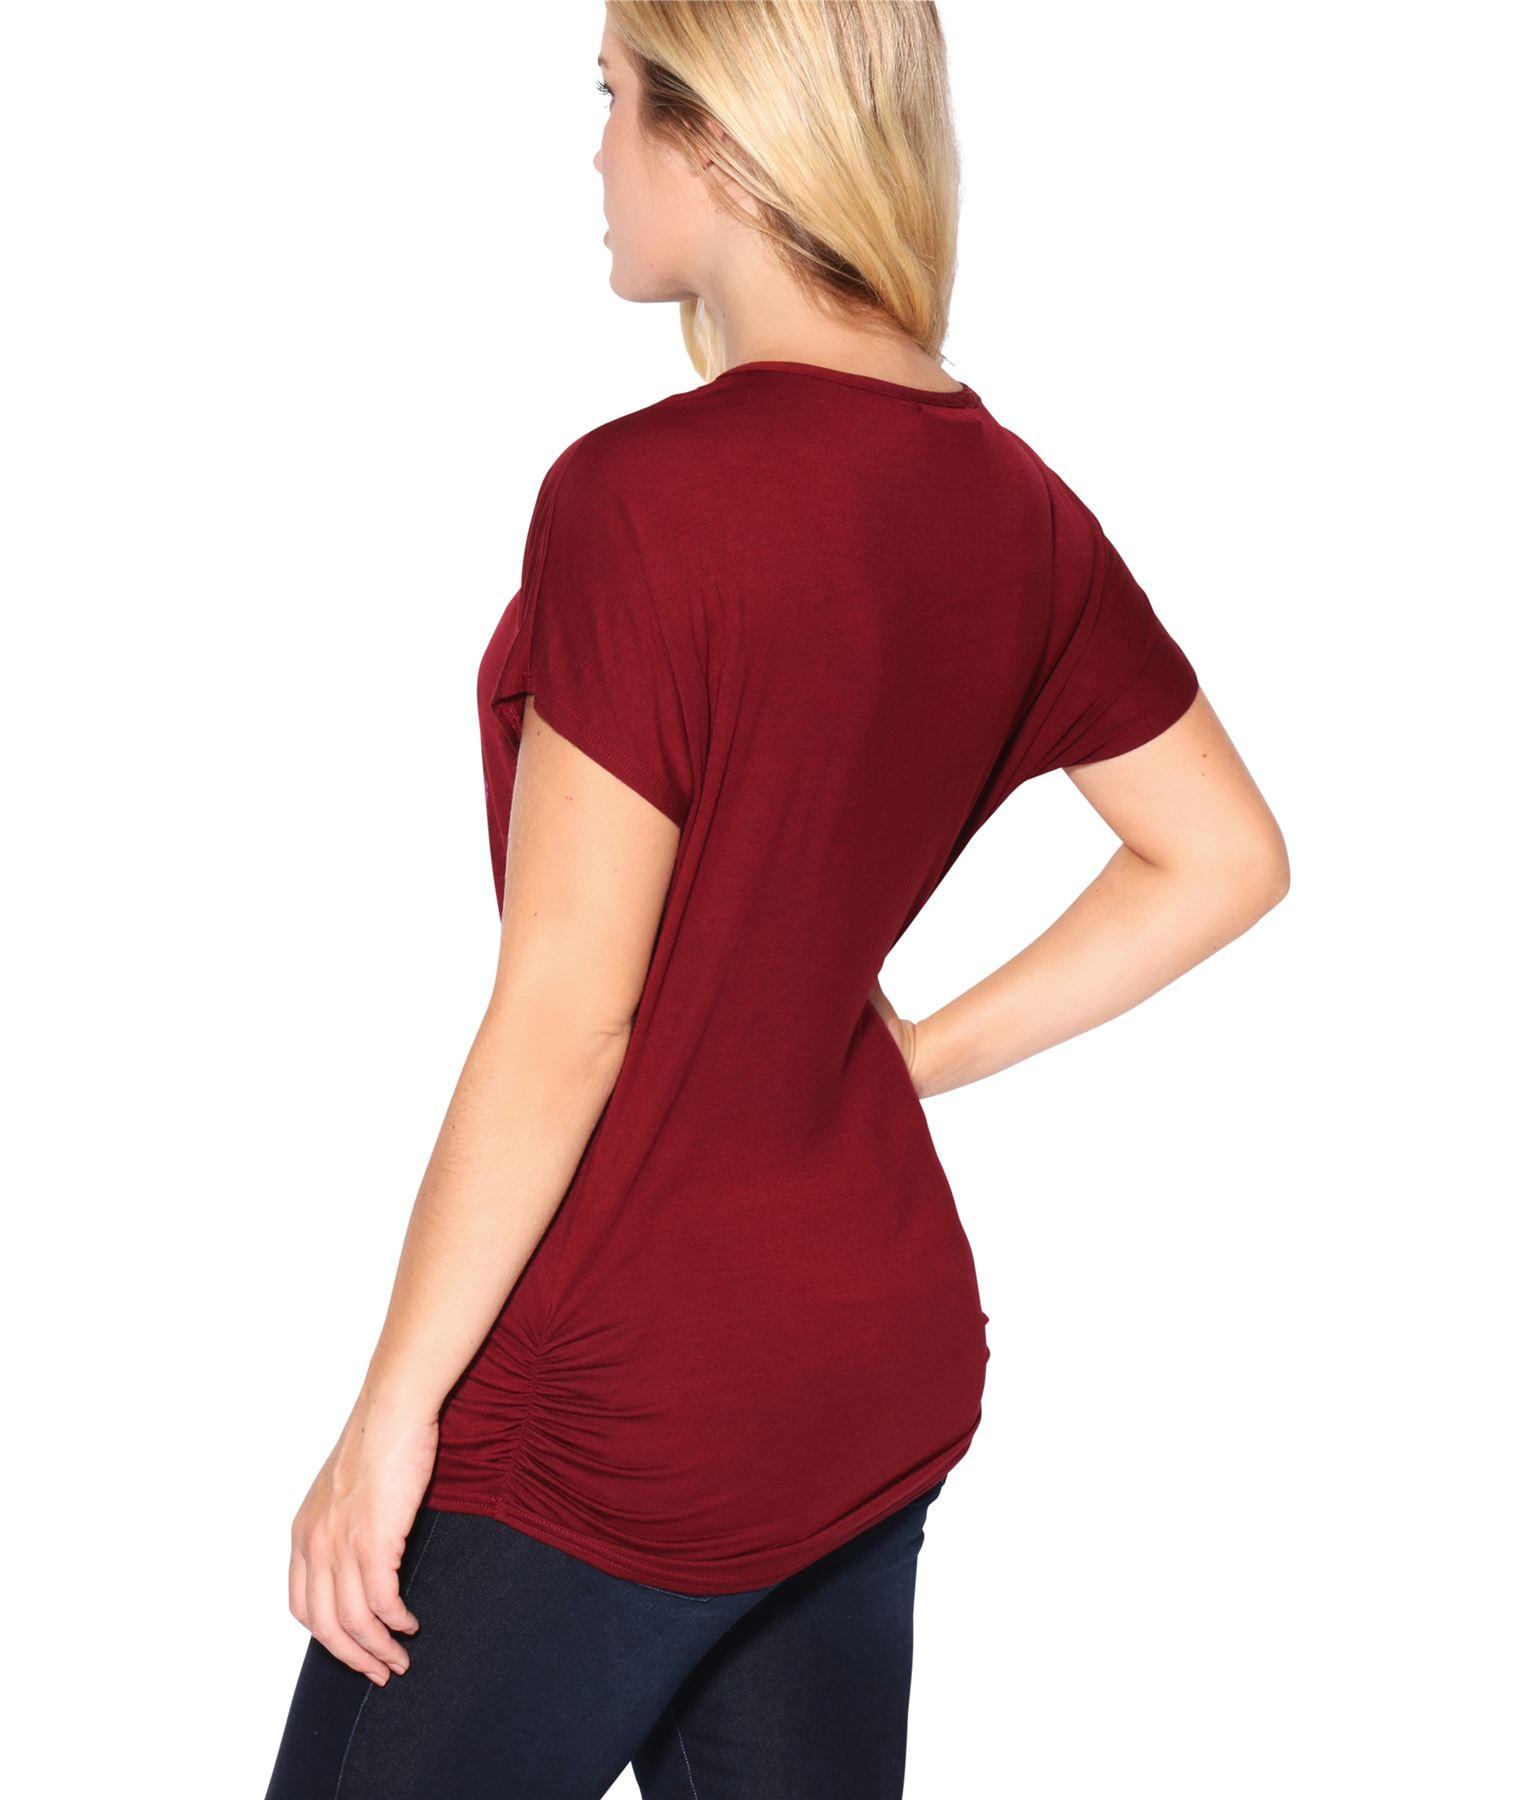 Womens-Oversized-Batwing-T-Shirt-Ladies-Baggy-Animal-Tiger-Blouse-Print-Top thumbnail 25